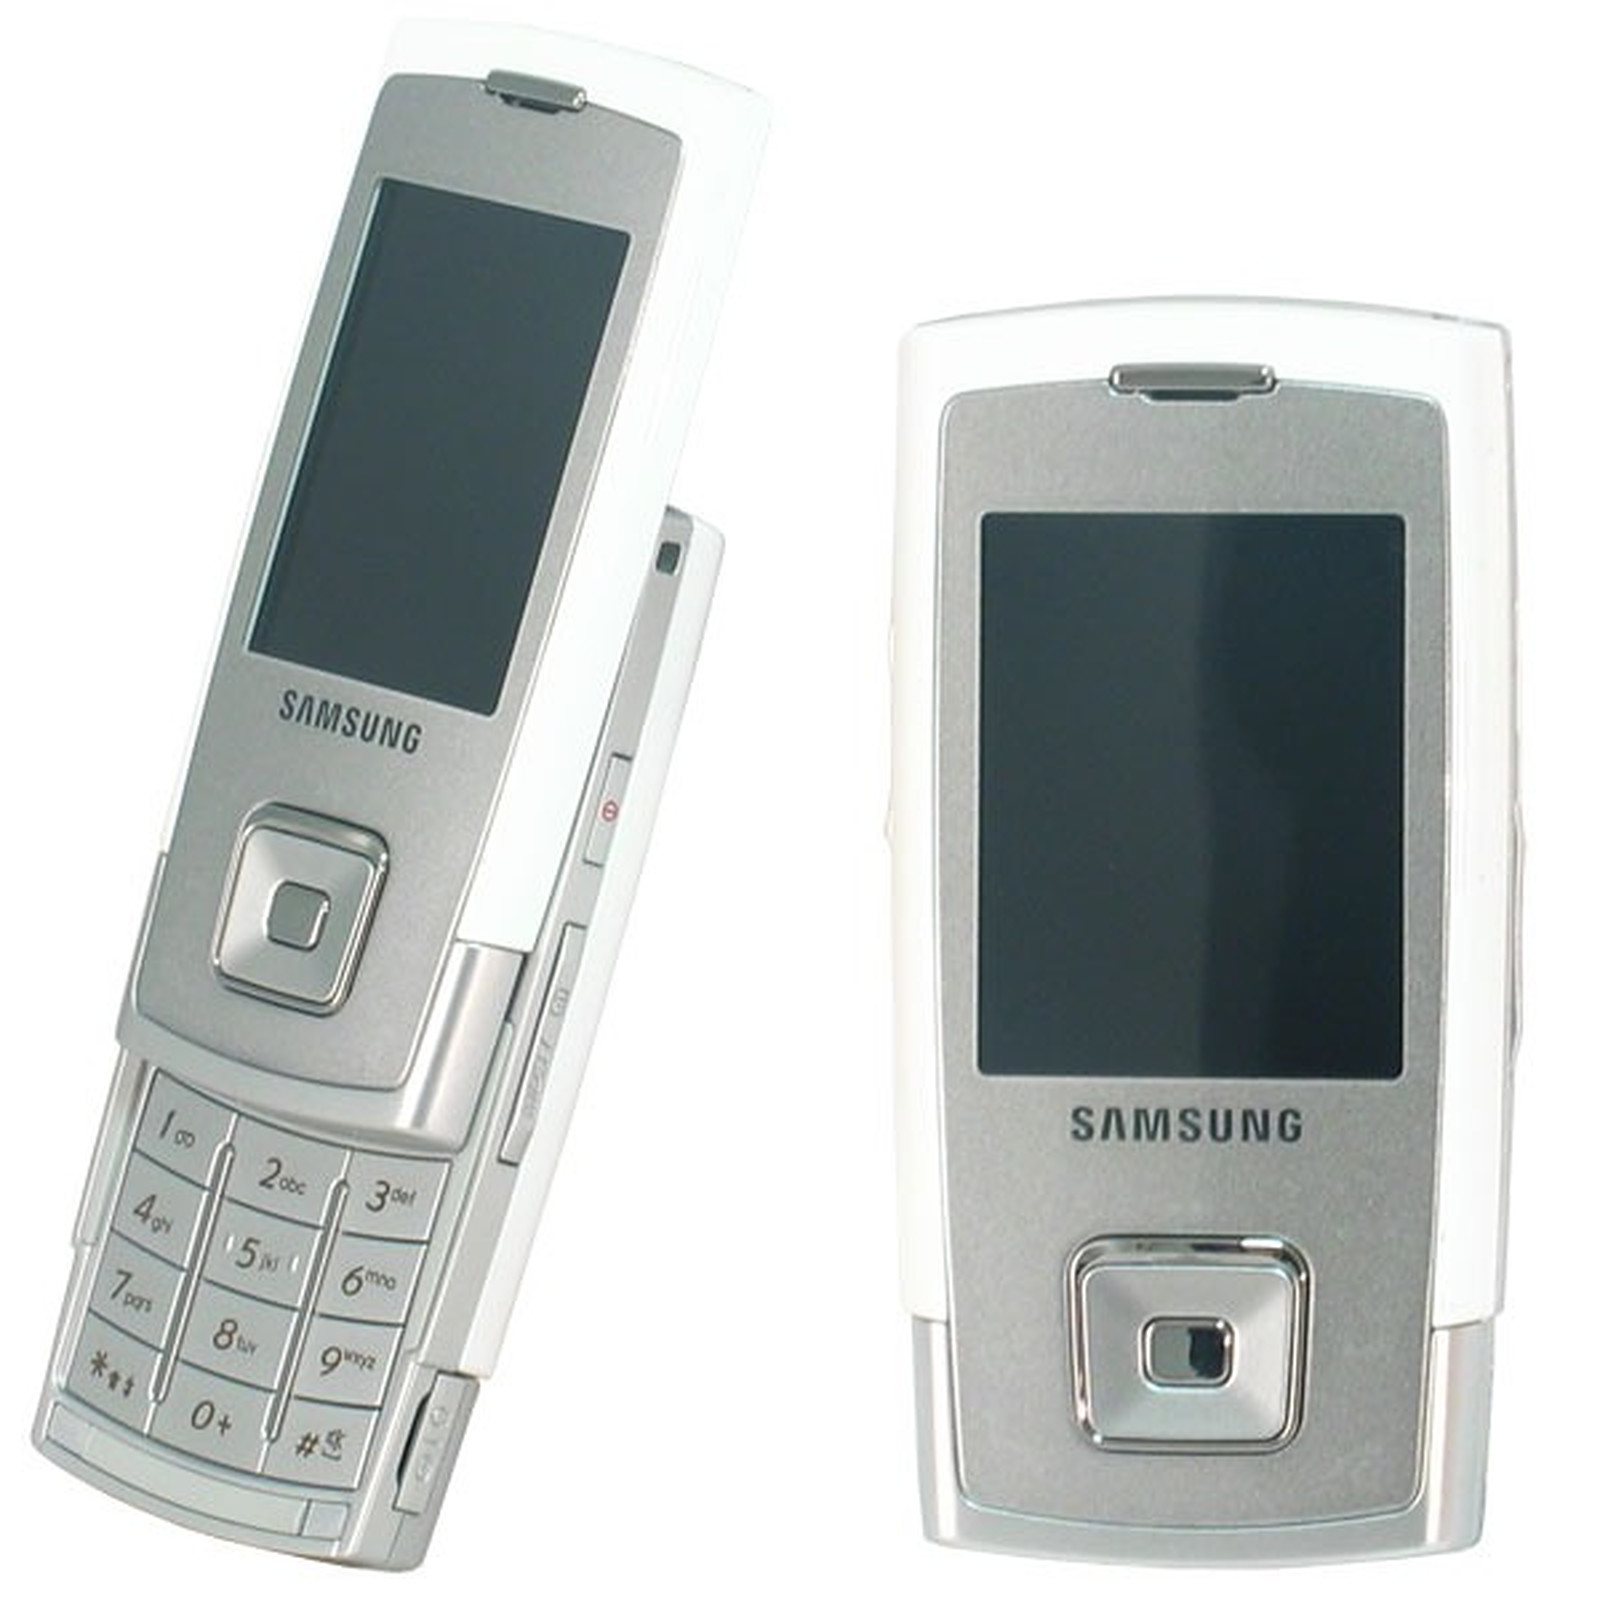 jeux mobile samsung sgh-e900